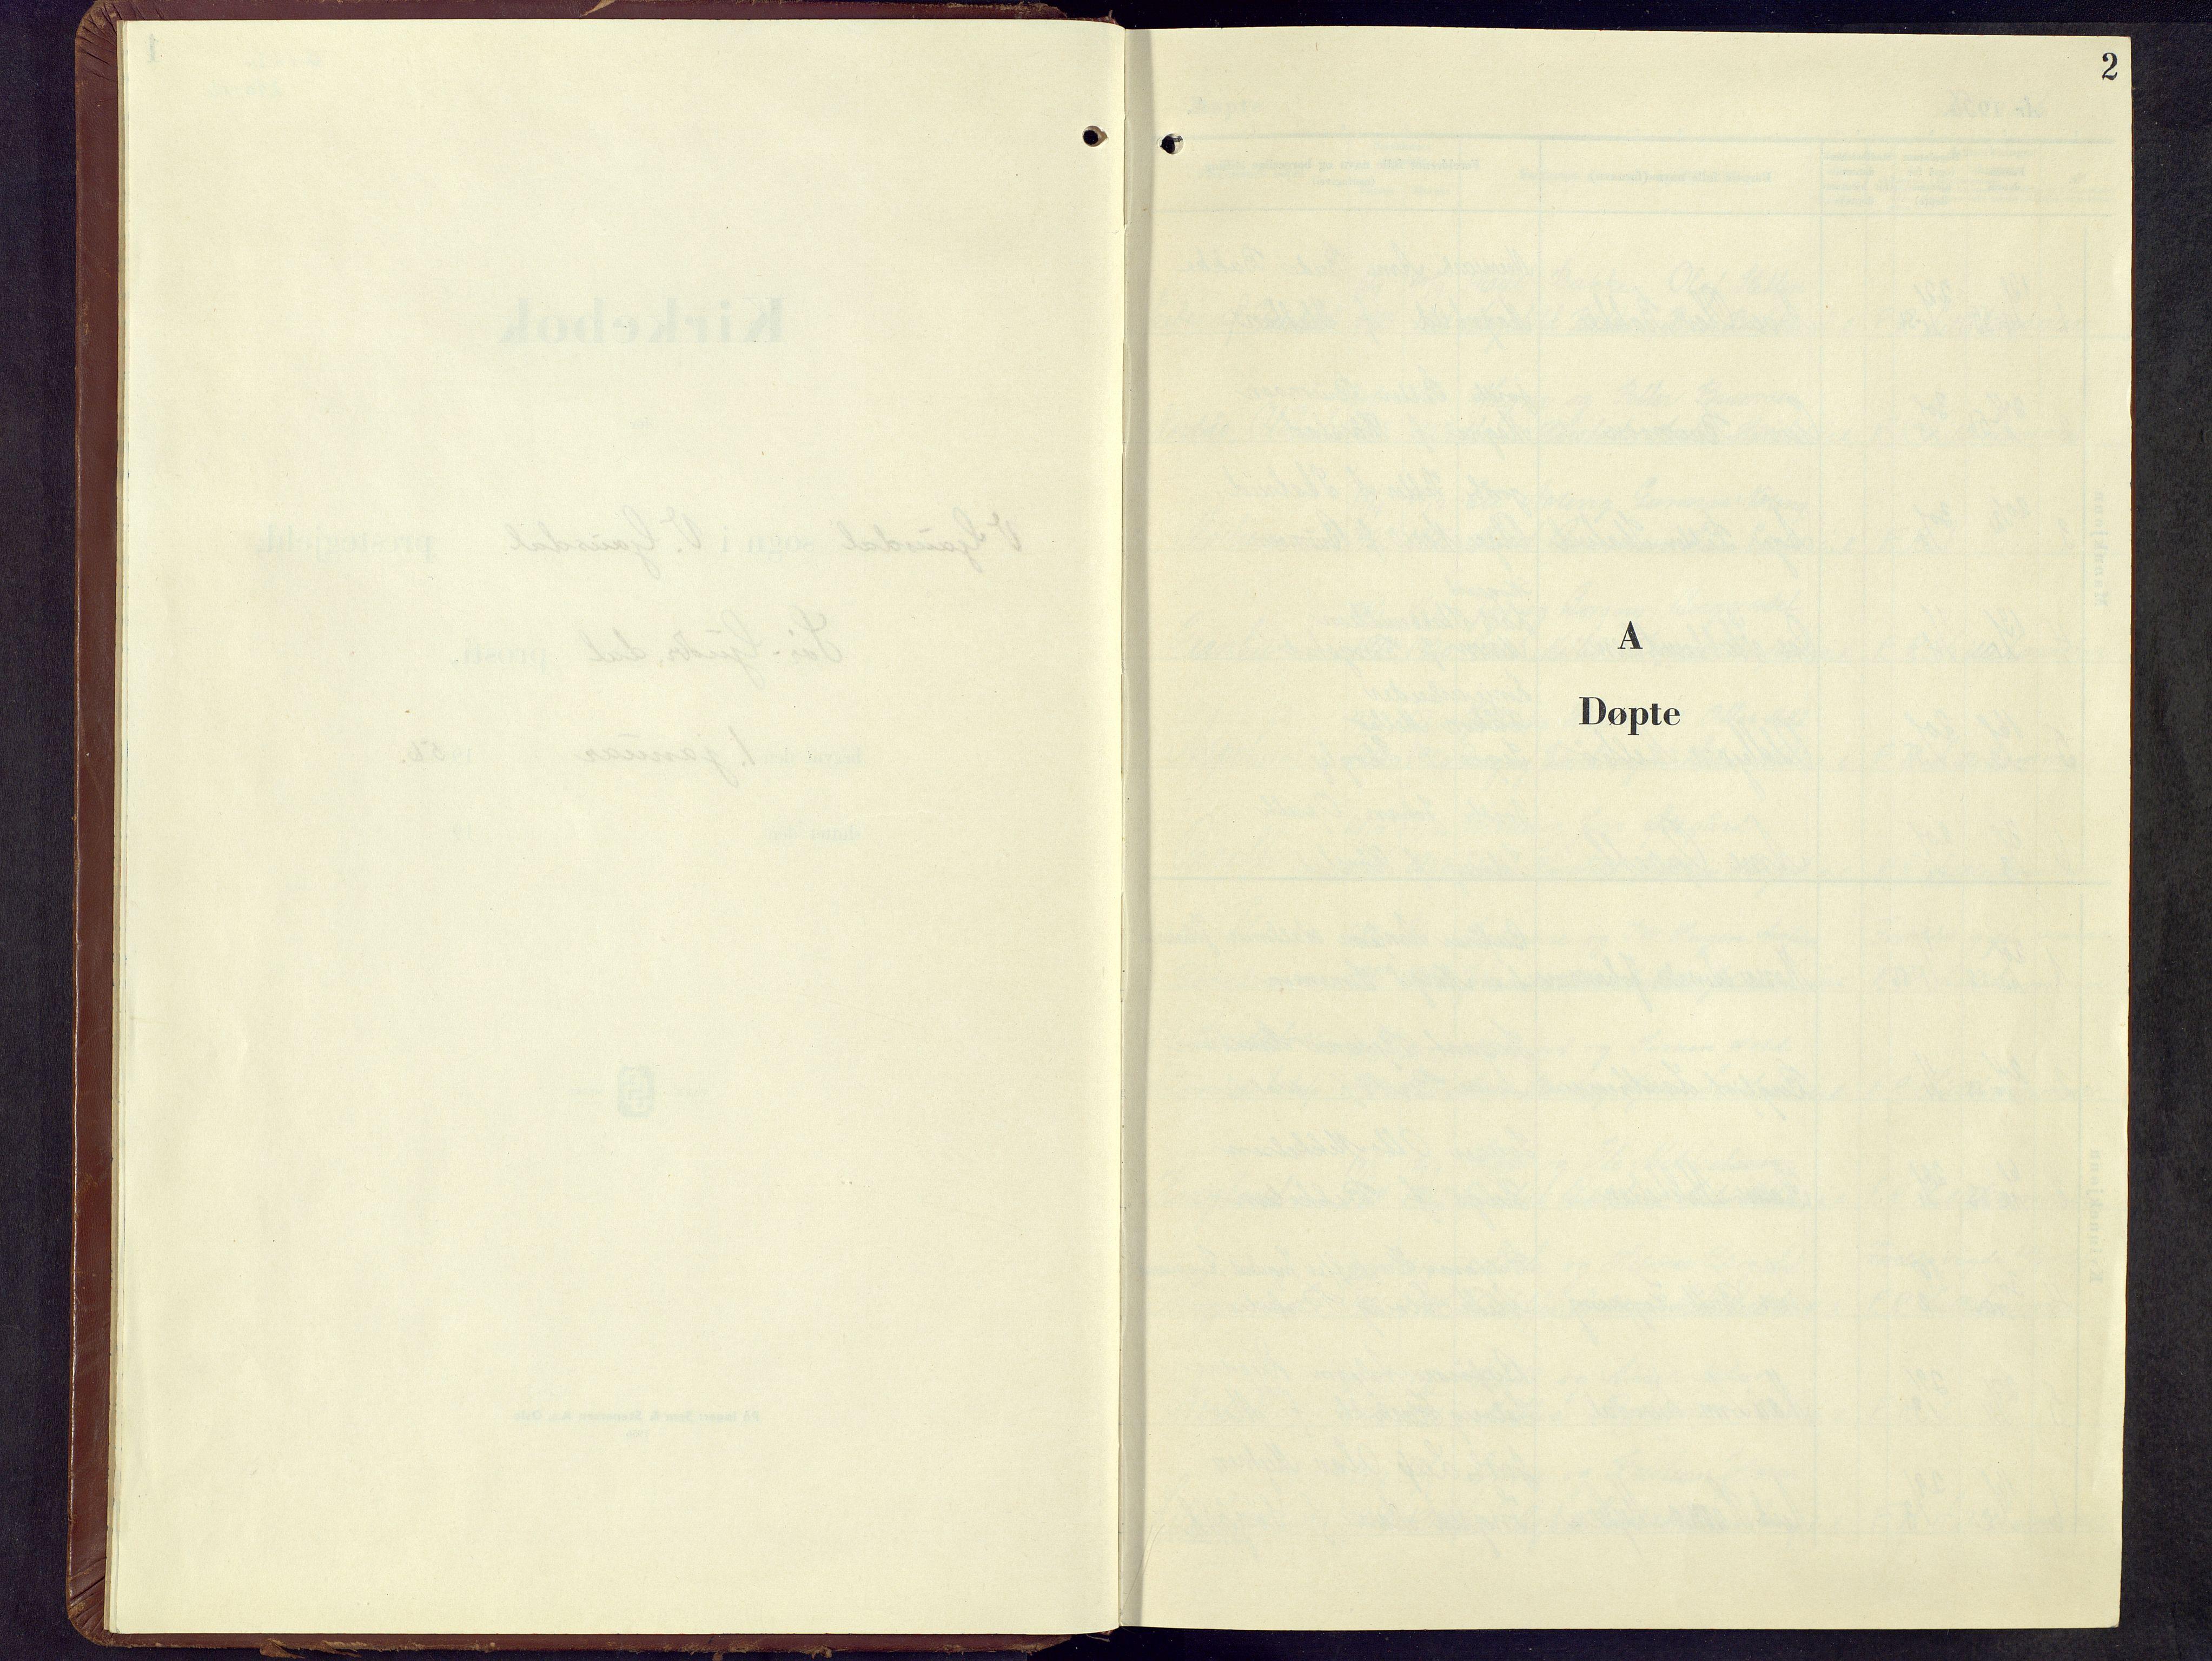 SAH, Vestre Gausdal prestekontor, Parish register (copy) no. 7, 1955-1977, p. 2